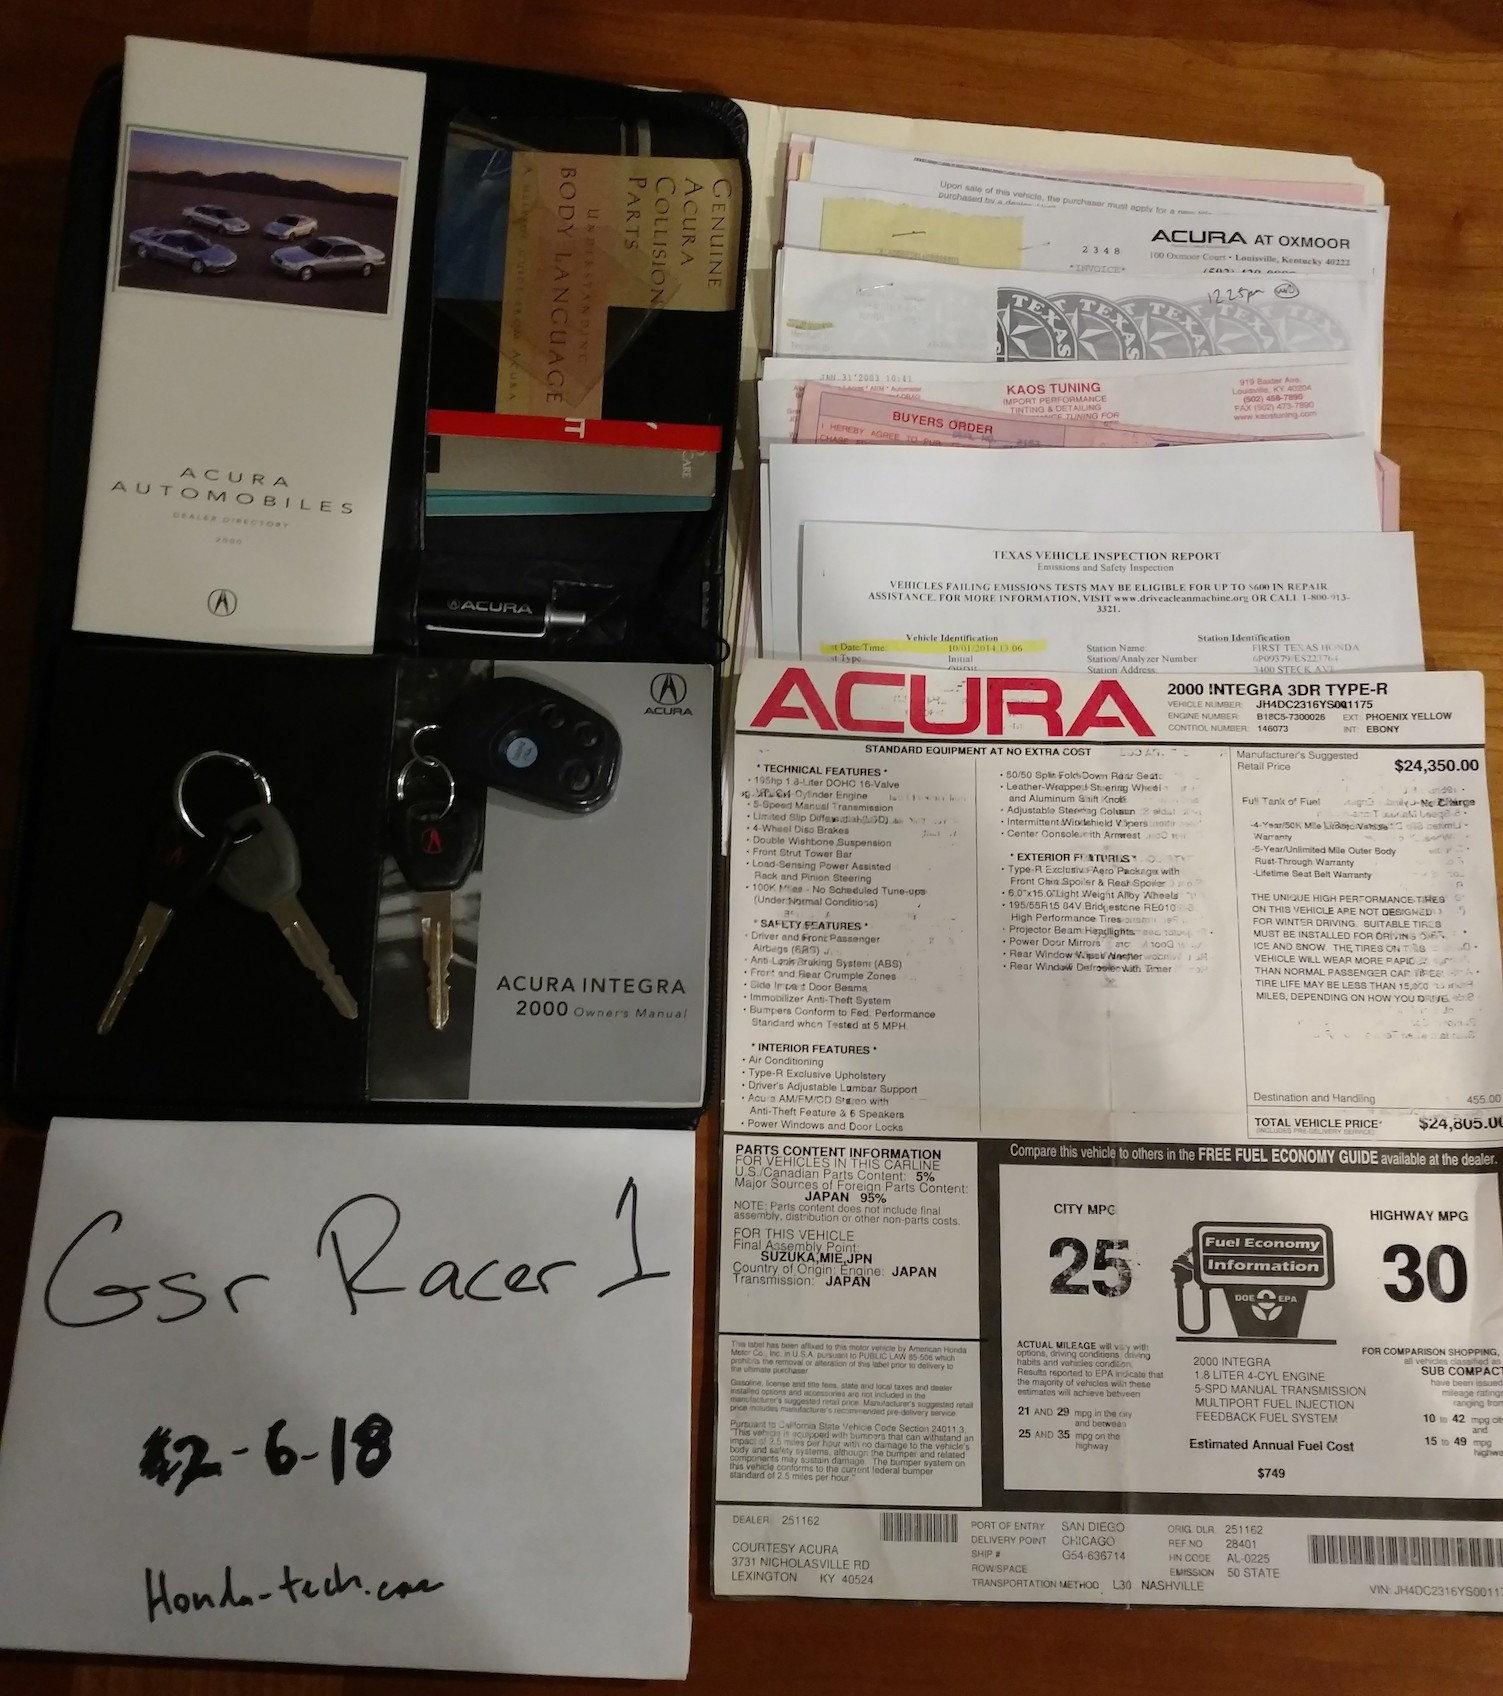 TX 2000 Acura Integra Type R